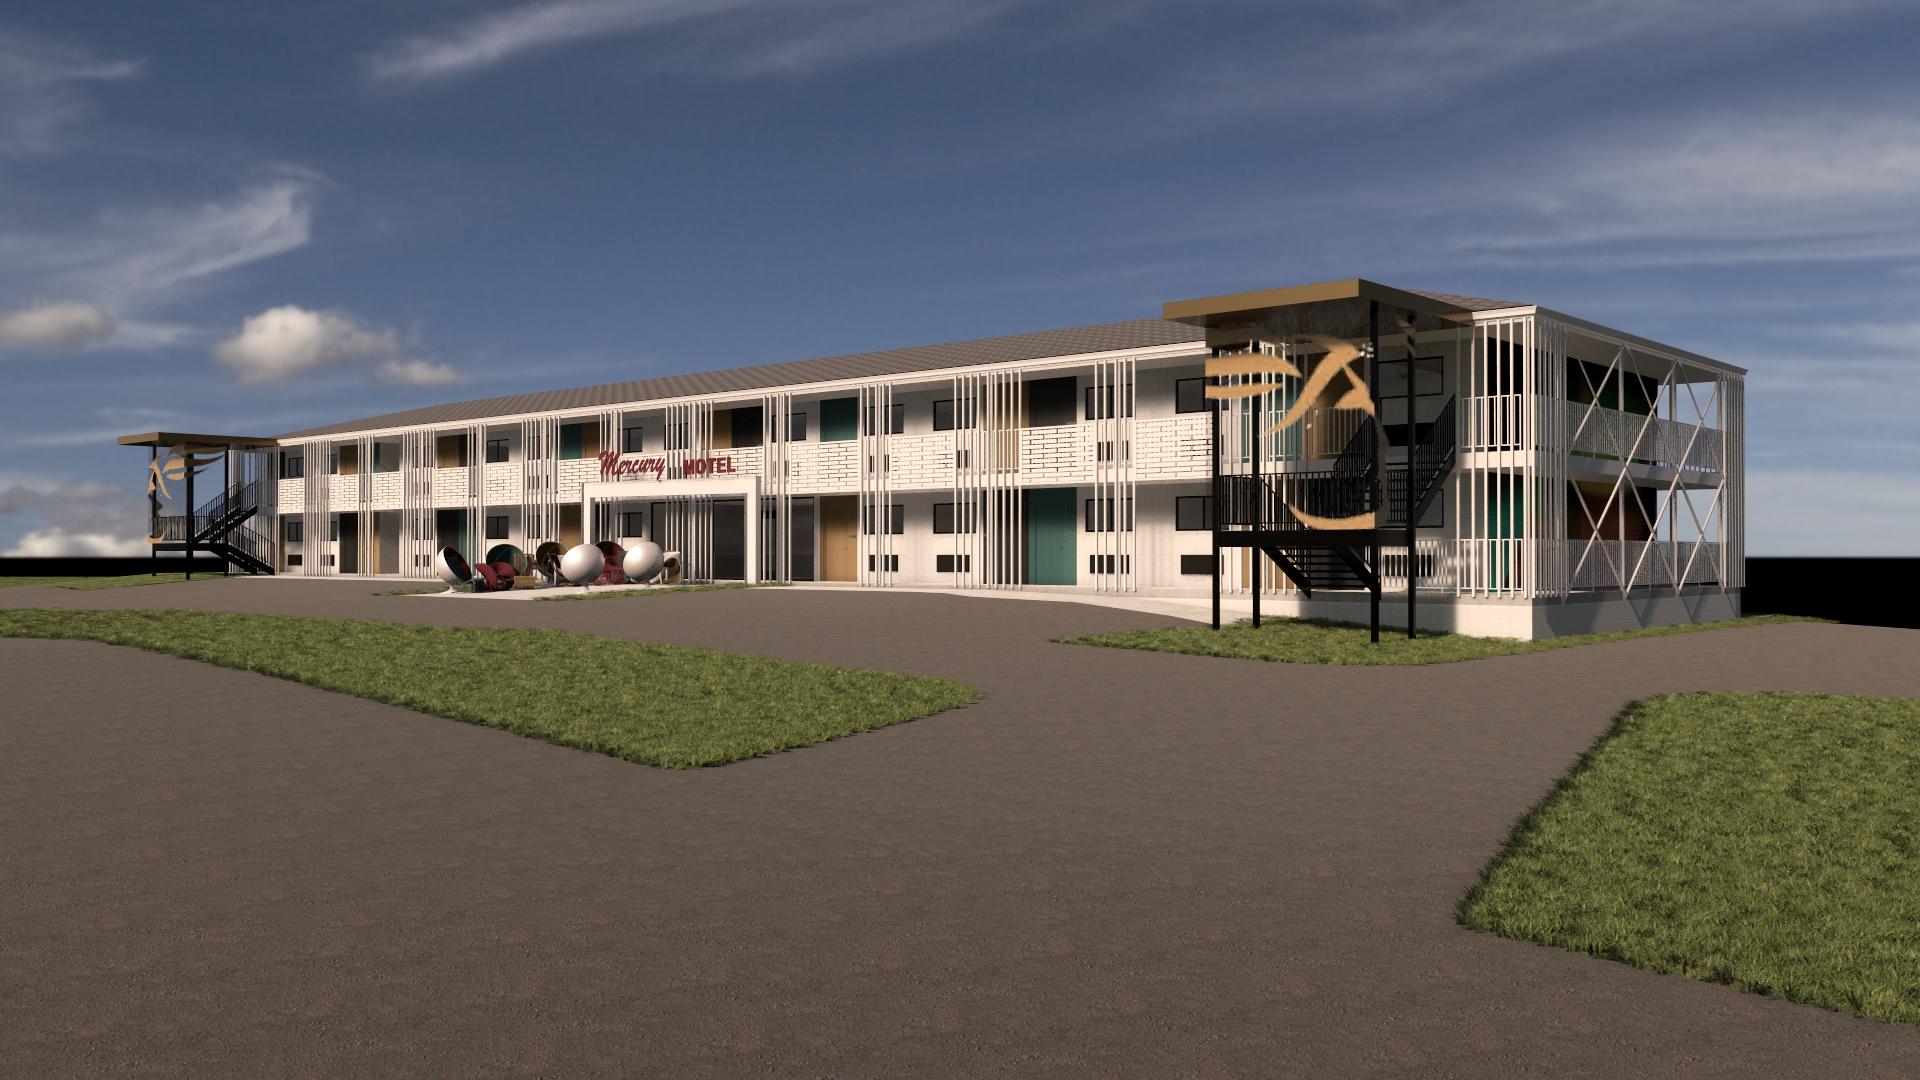 1960's Motel Renovation Concept